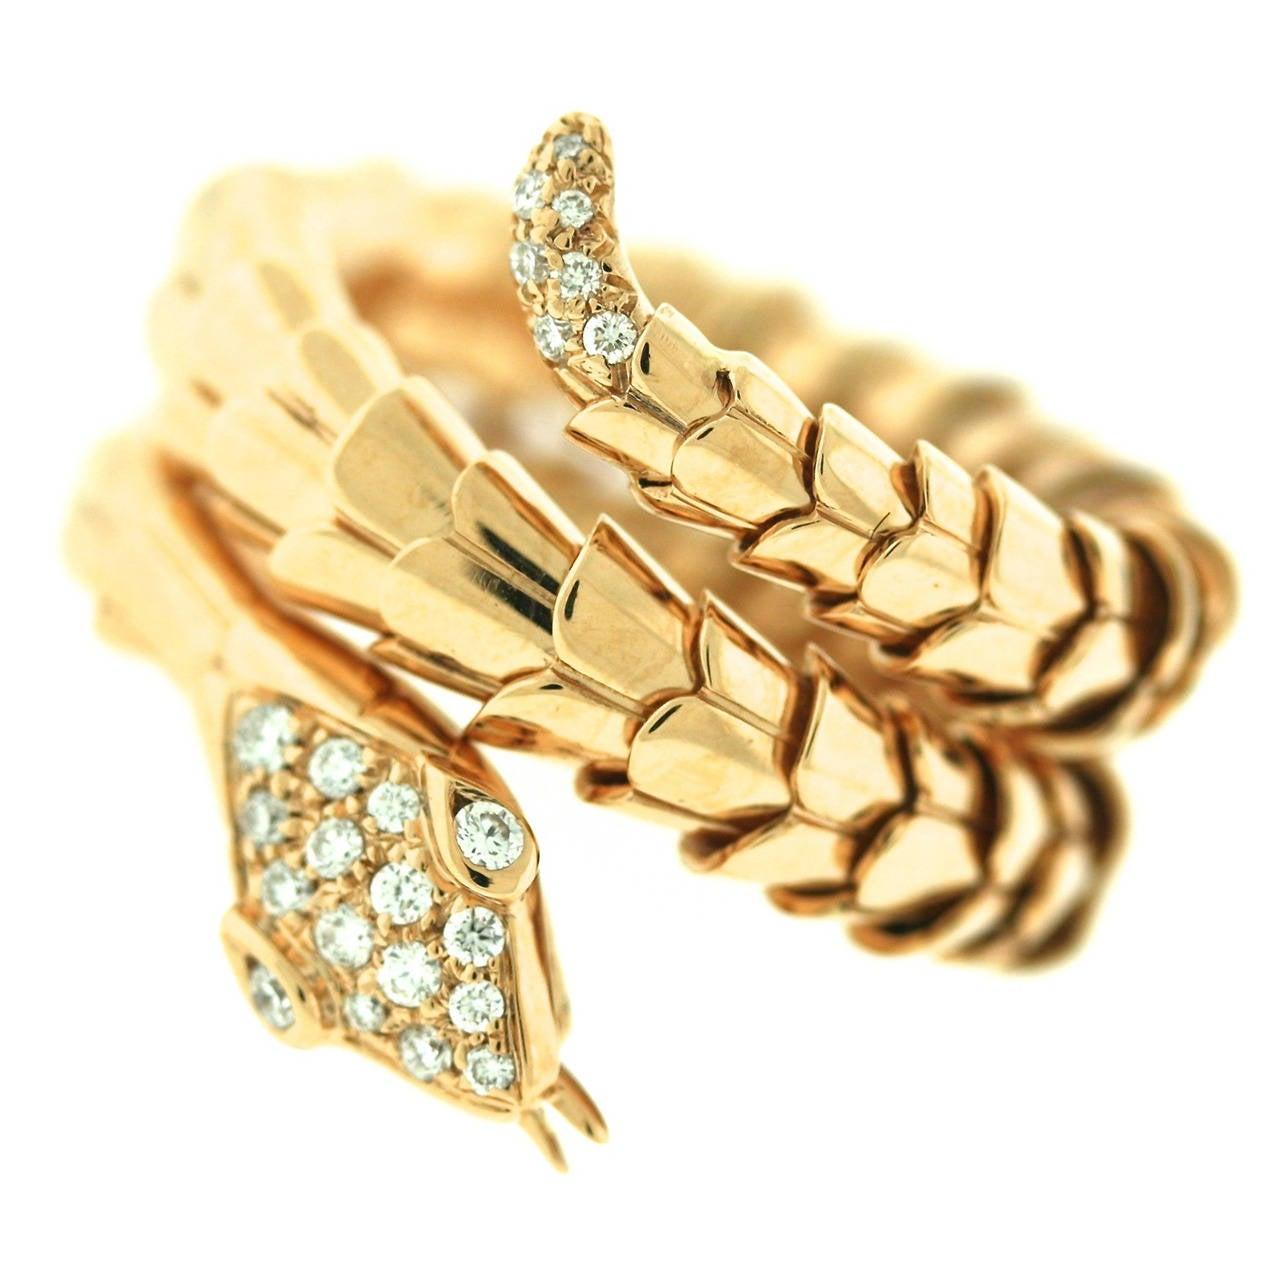 illario gold serpent ring at 1stdibs